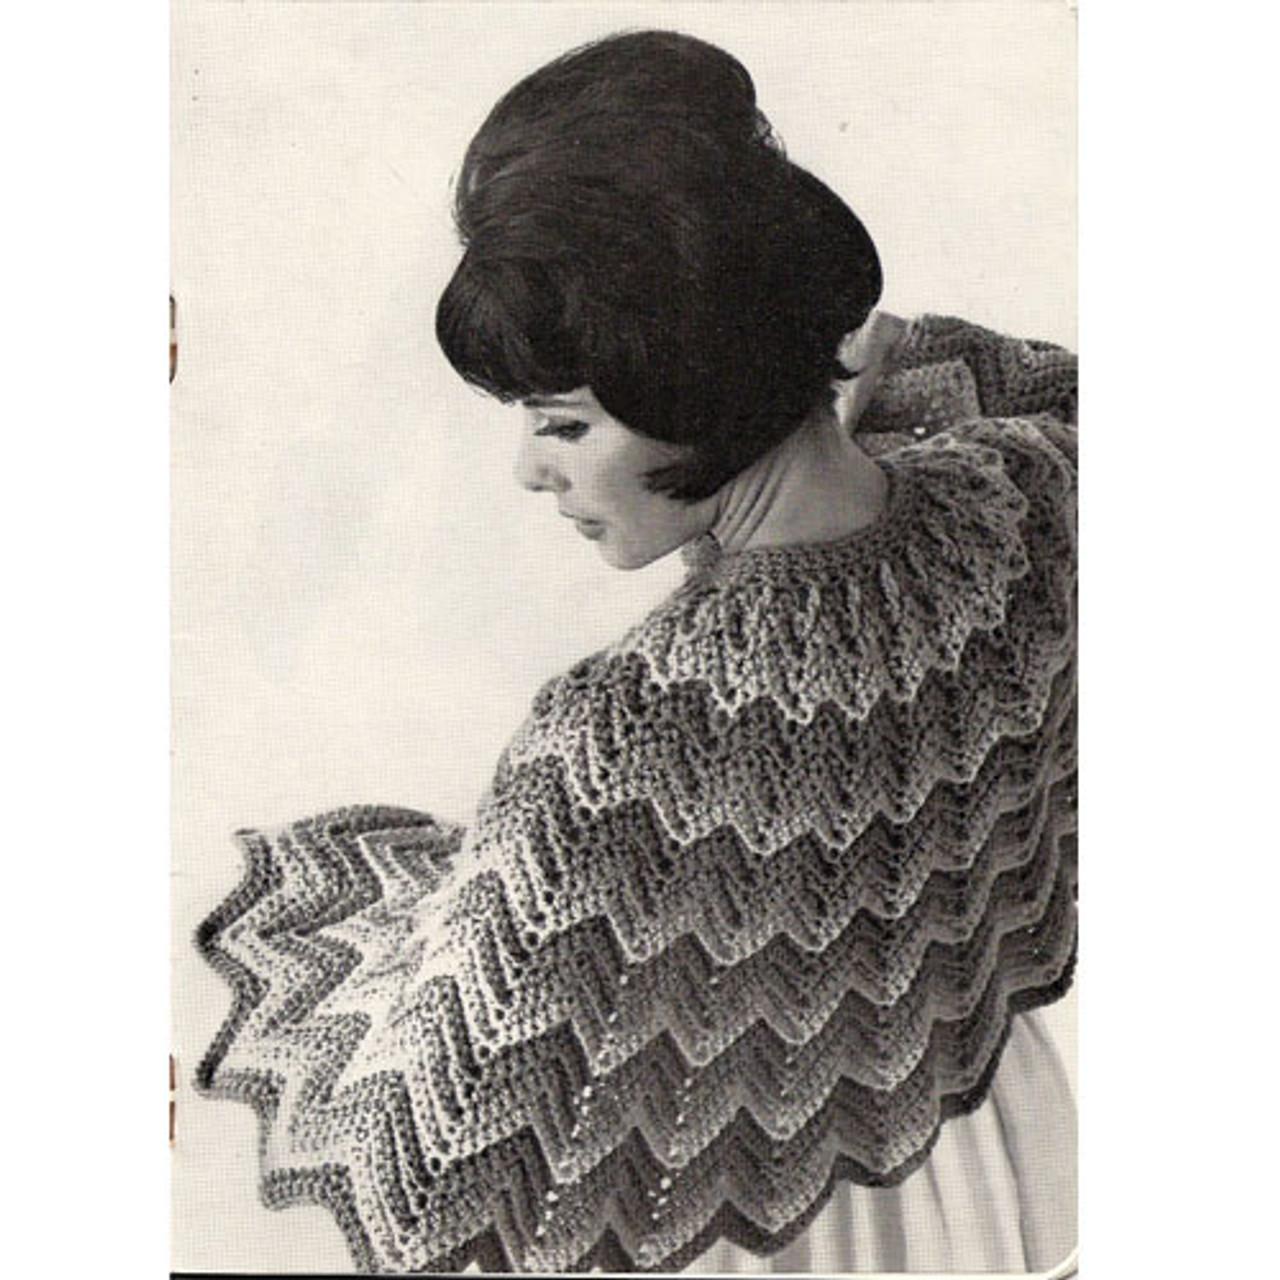 Waist Length Crochet Ripple Cape Pattern